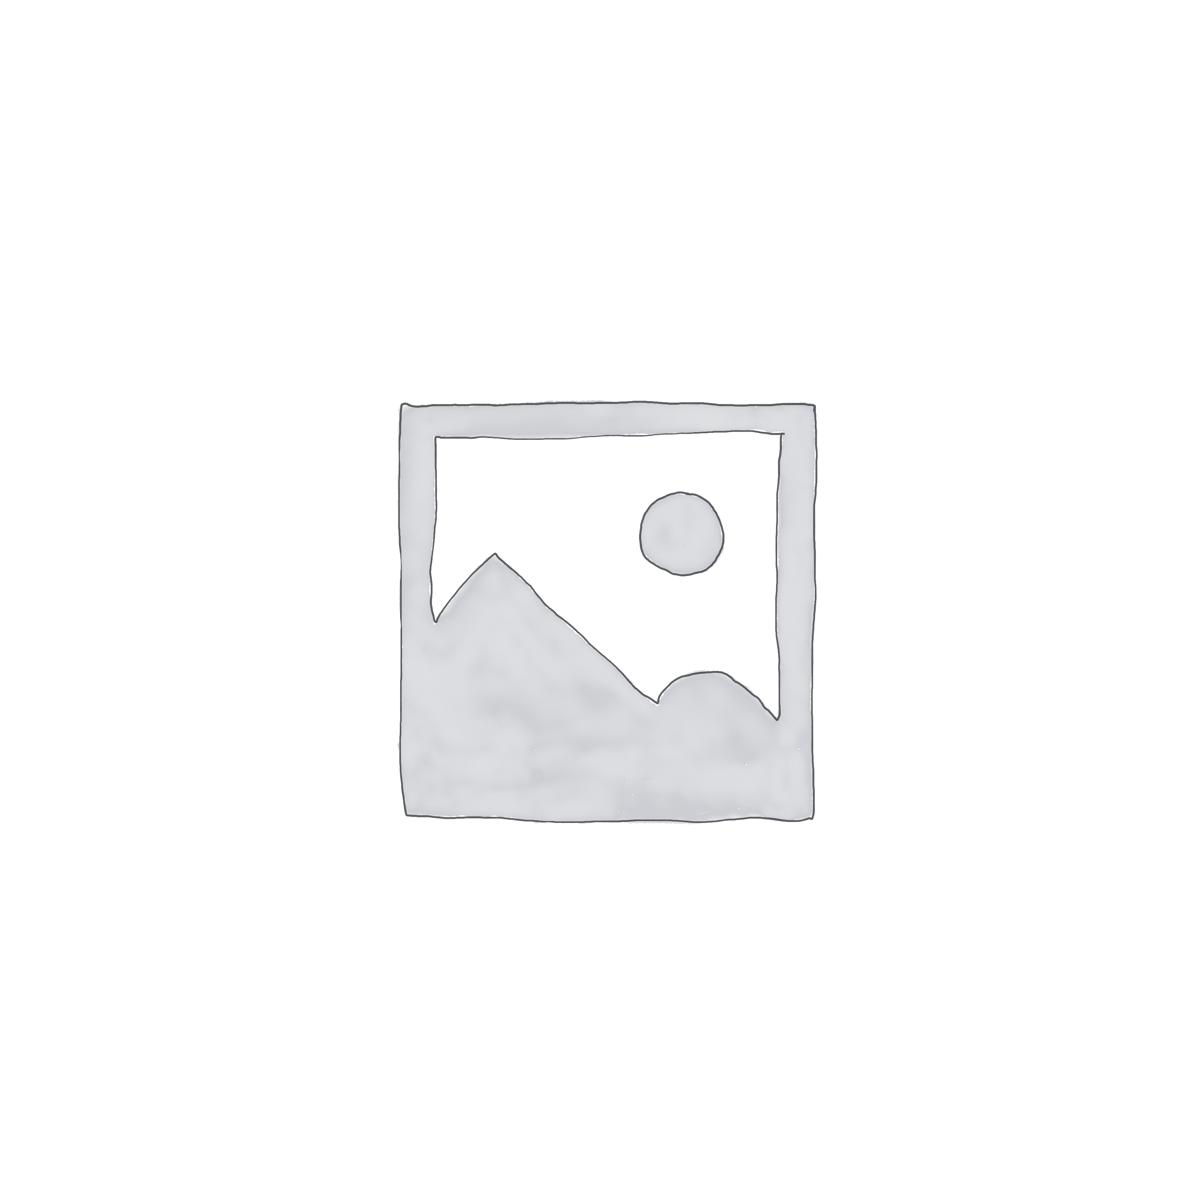 Pink Mirabilis Flowers and Tropical Leaves Wallpaper Mural